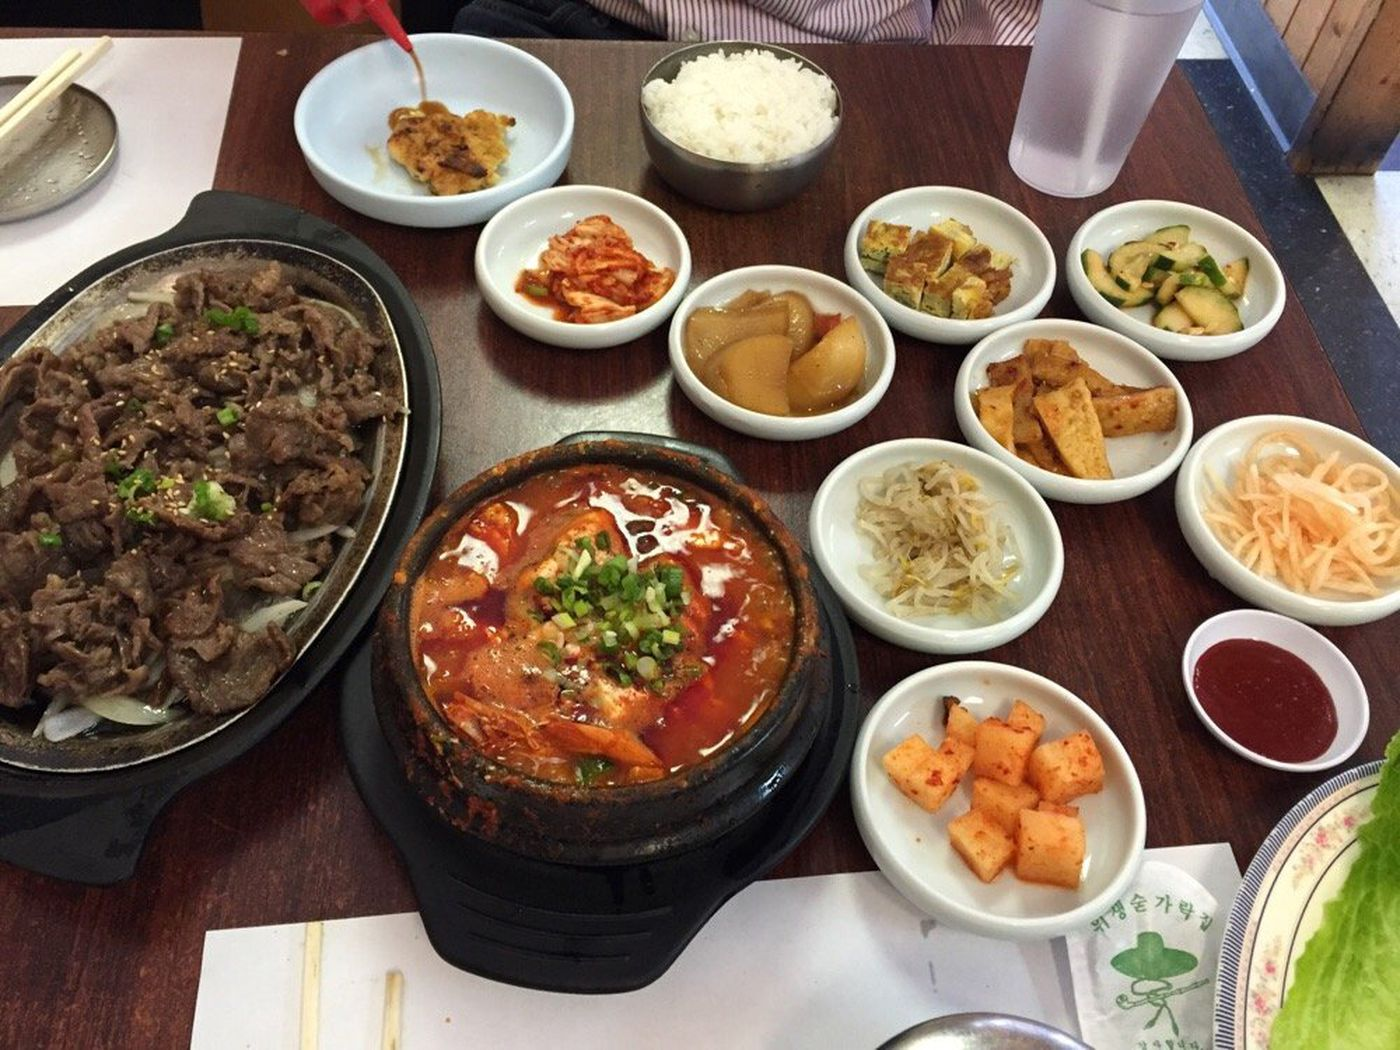 Five Top Notch Korean Restaurants to Try in Nashville - Eater Nashville